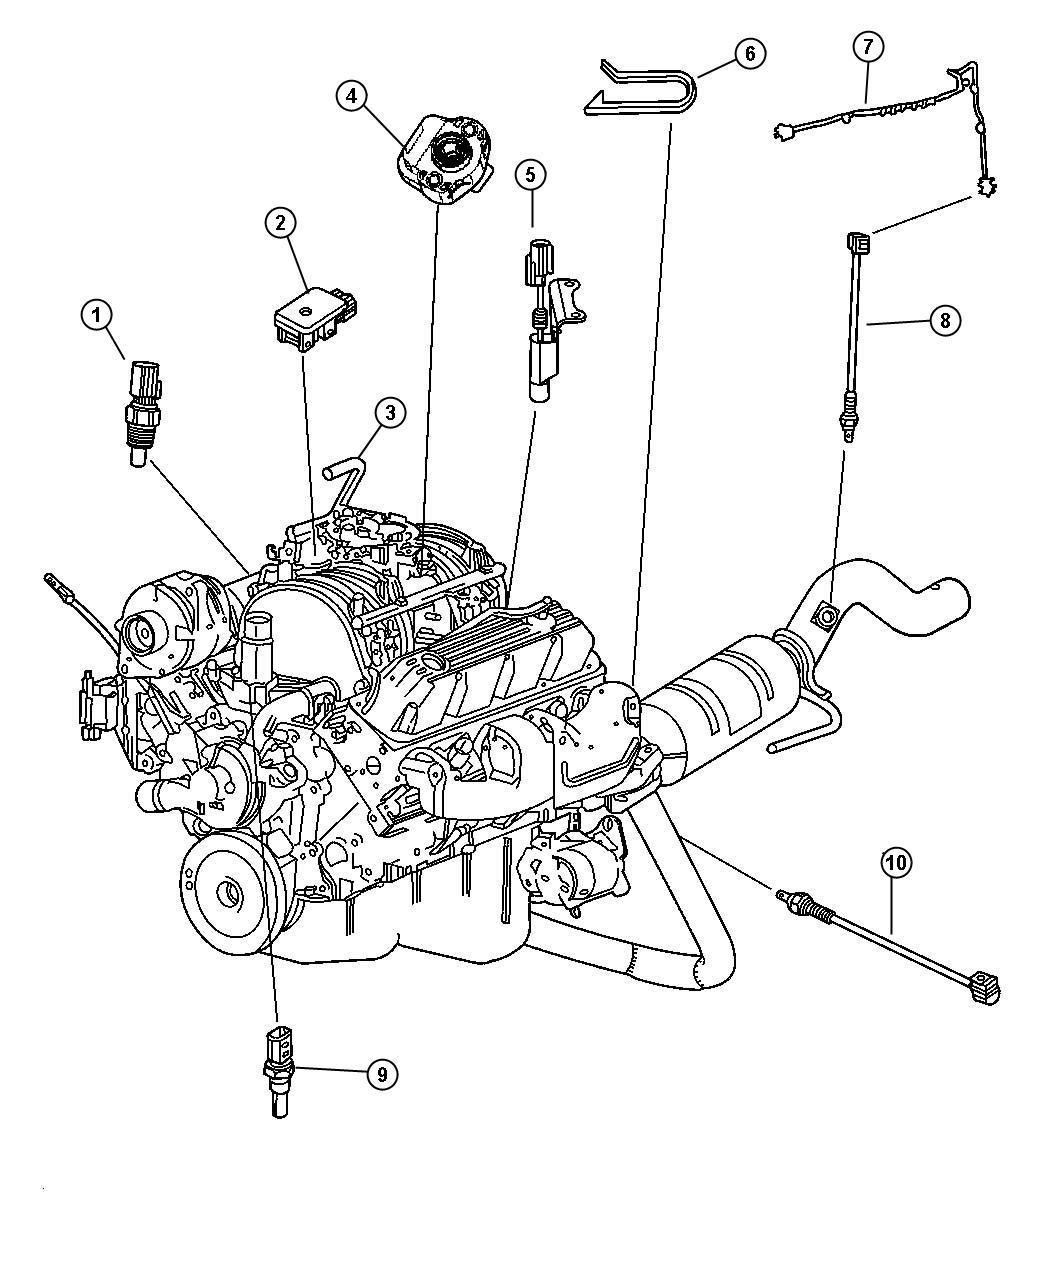 Dodge Ram 2500 Sensor. Crankshaft position. Frontouter